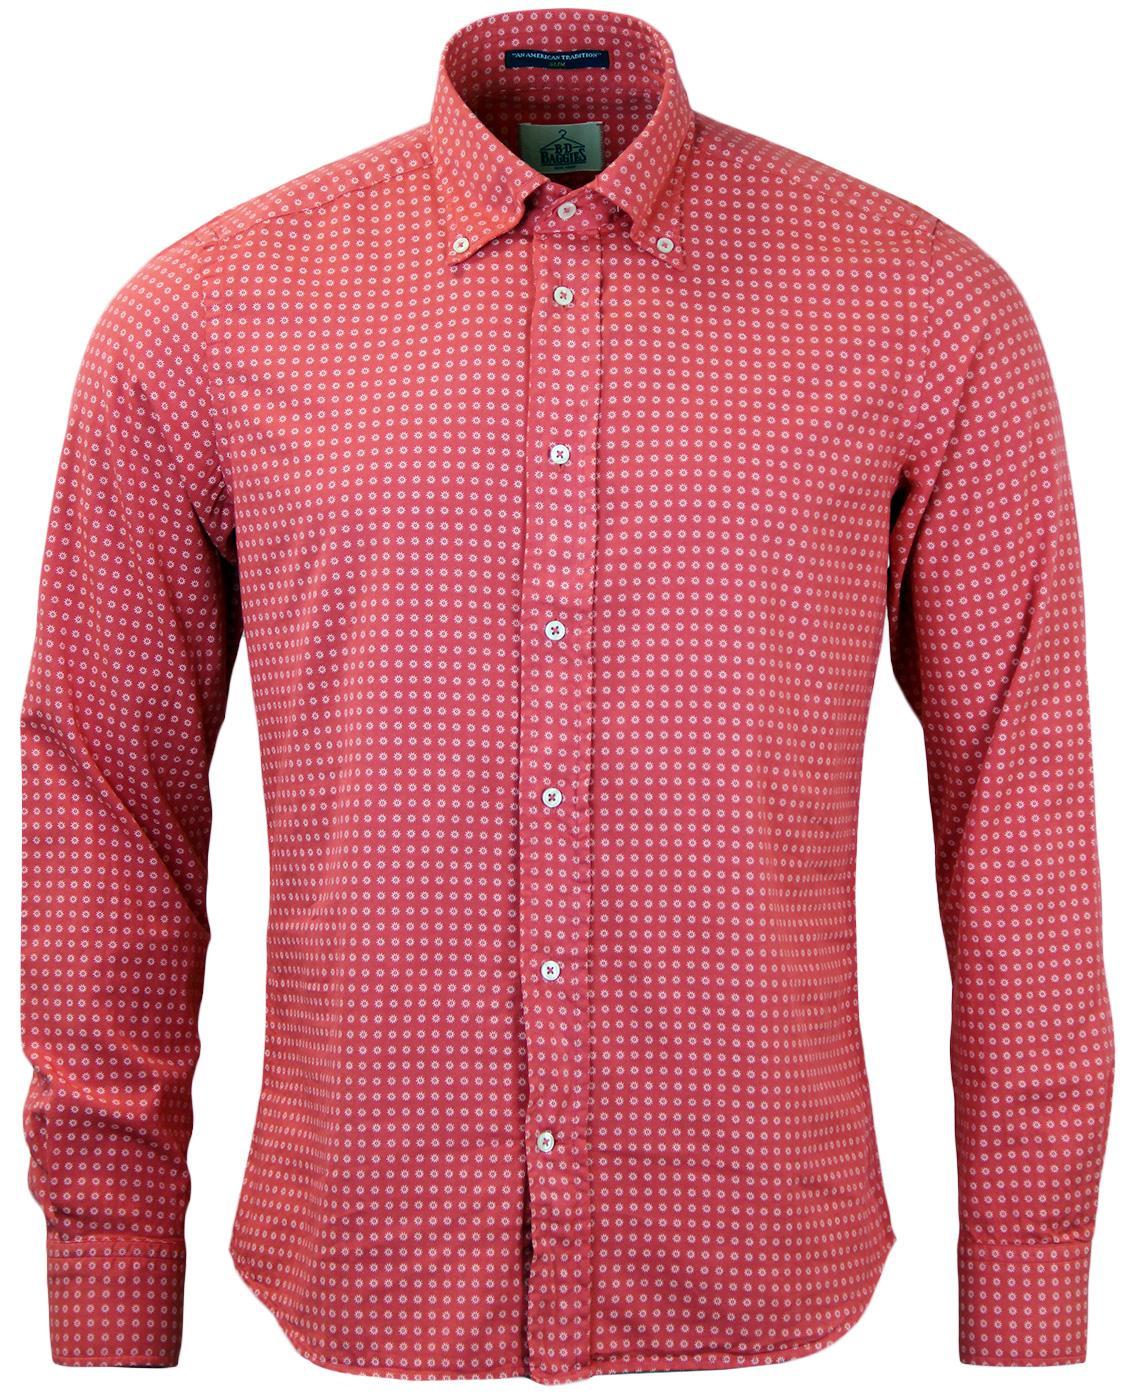 Dexter B D BAGGIES Retro Micro Floral Print Shirt